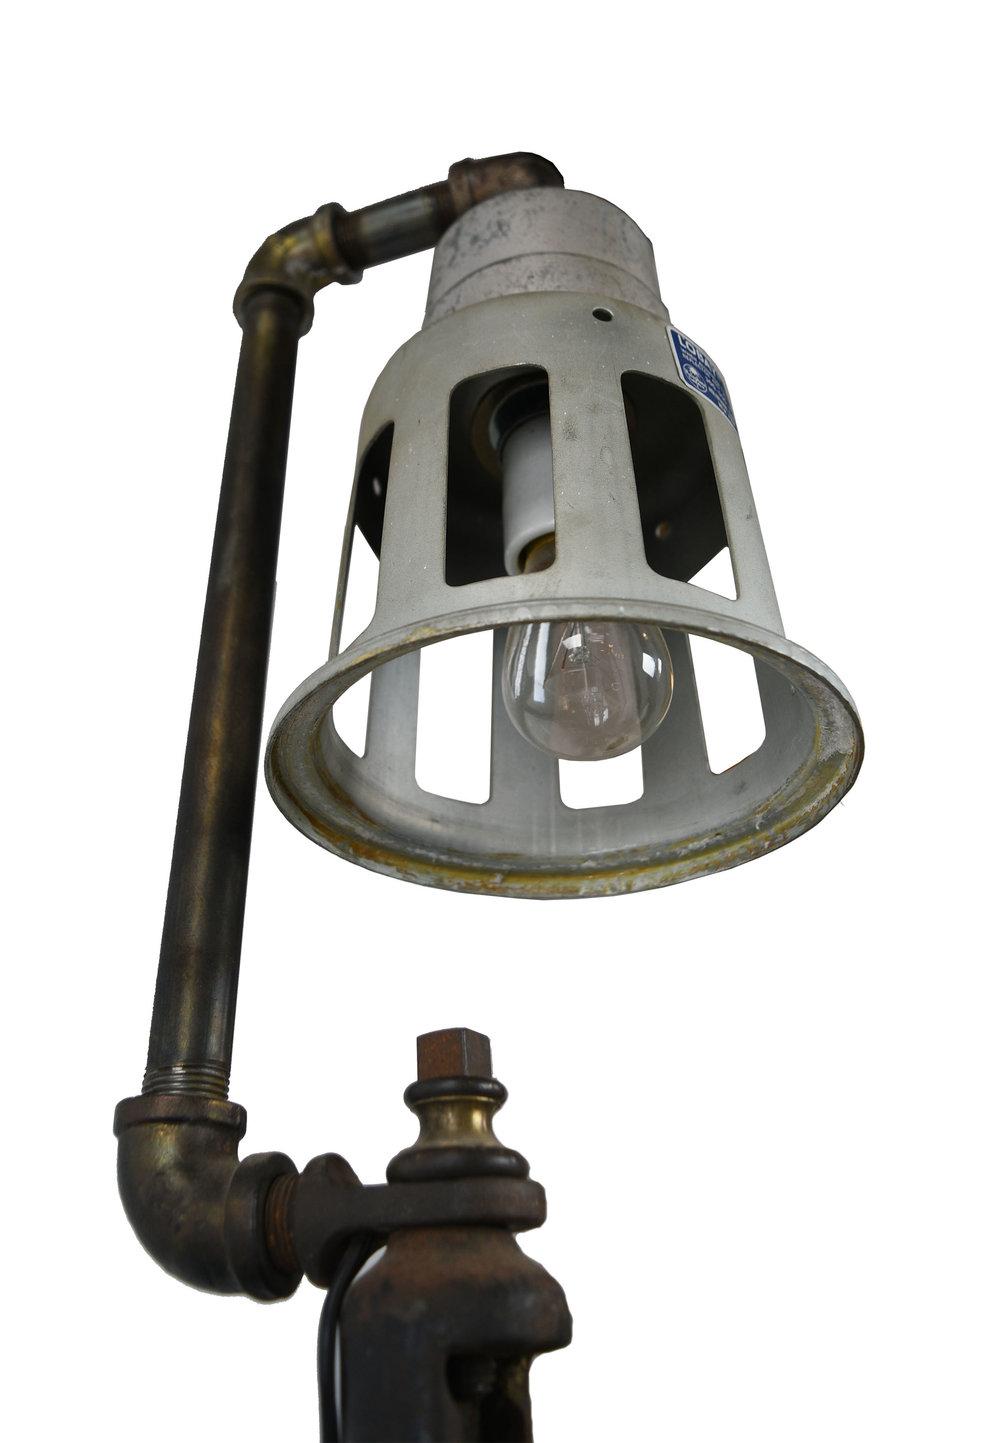 45177 industrial steampunk light top.jpg